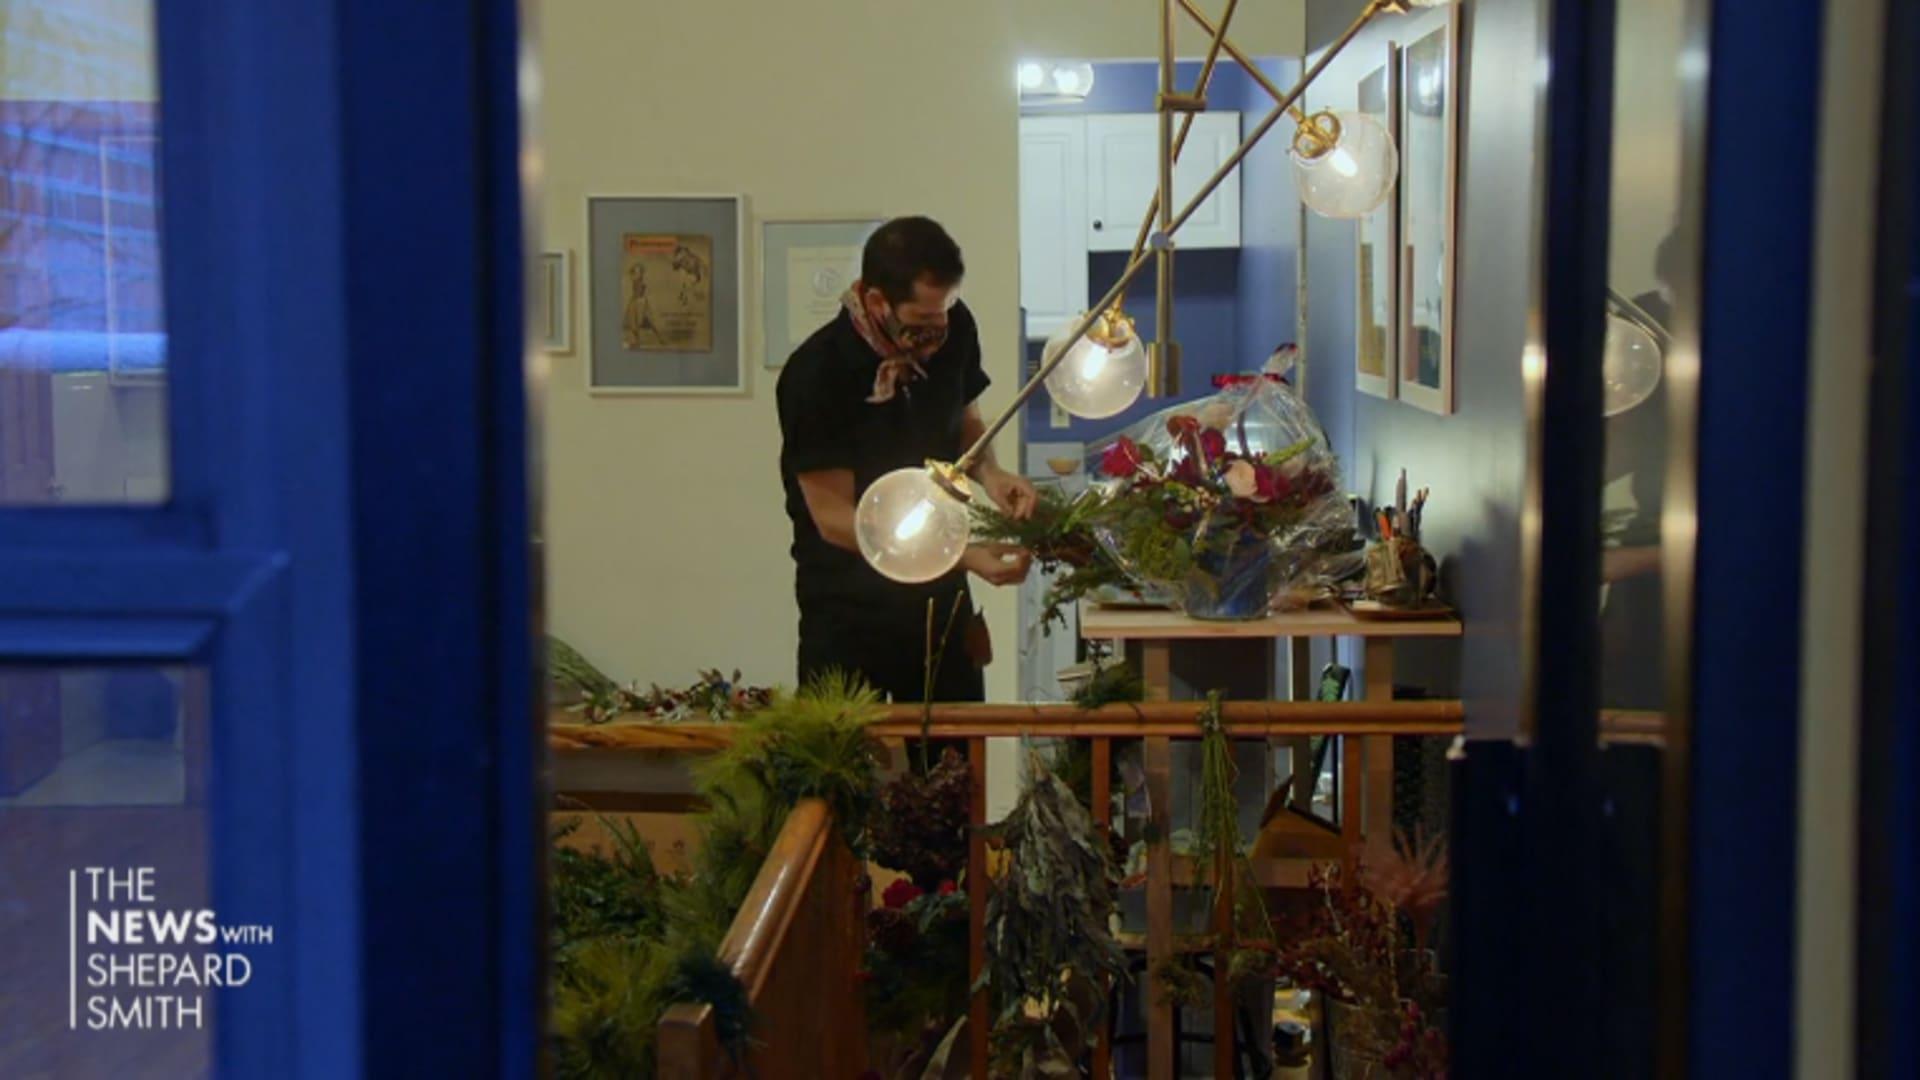 Actor Robbie Fairchild works on a flower arrangement inside his New York City apartment